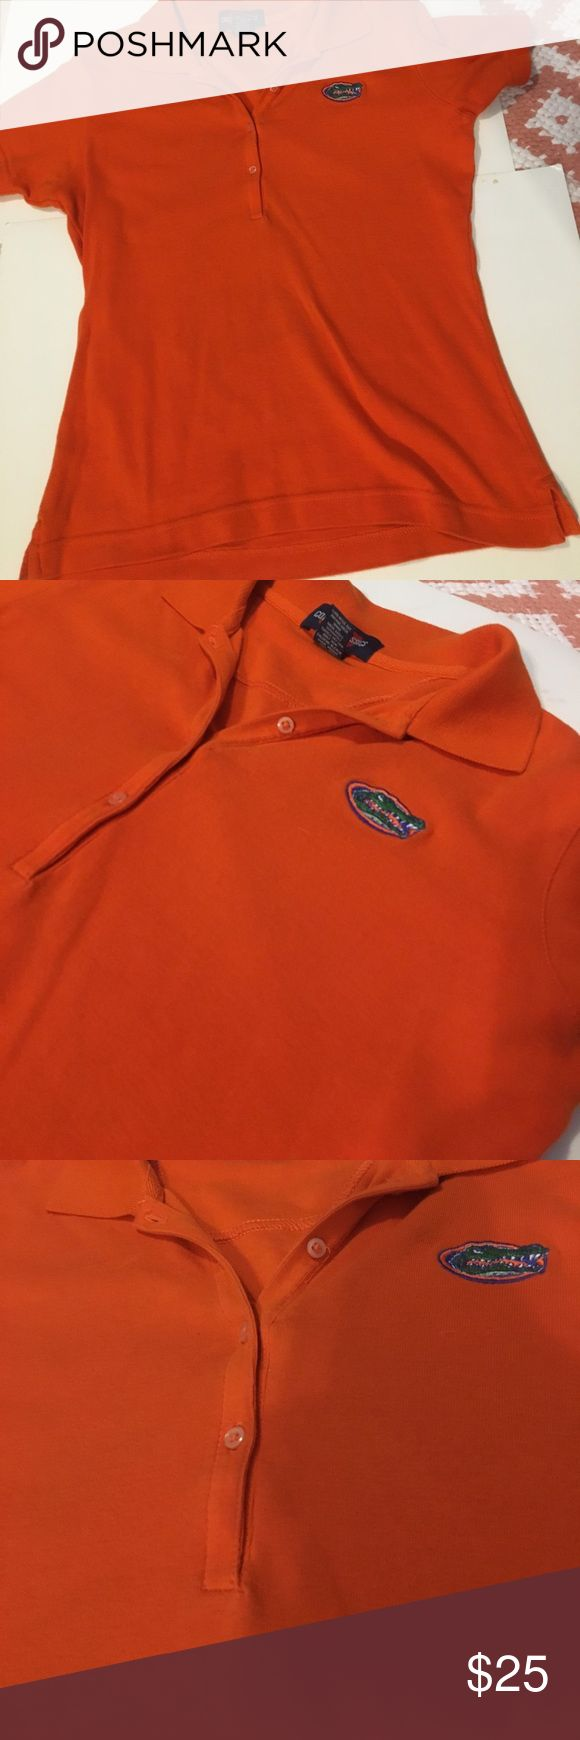 Orange short sleeve collared Florida gators shirt Orange short sleeve collared Florida gators golf shirt Tops Button Down Shirts